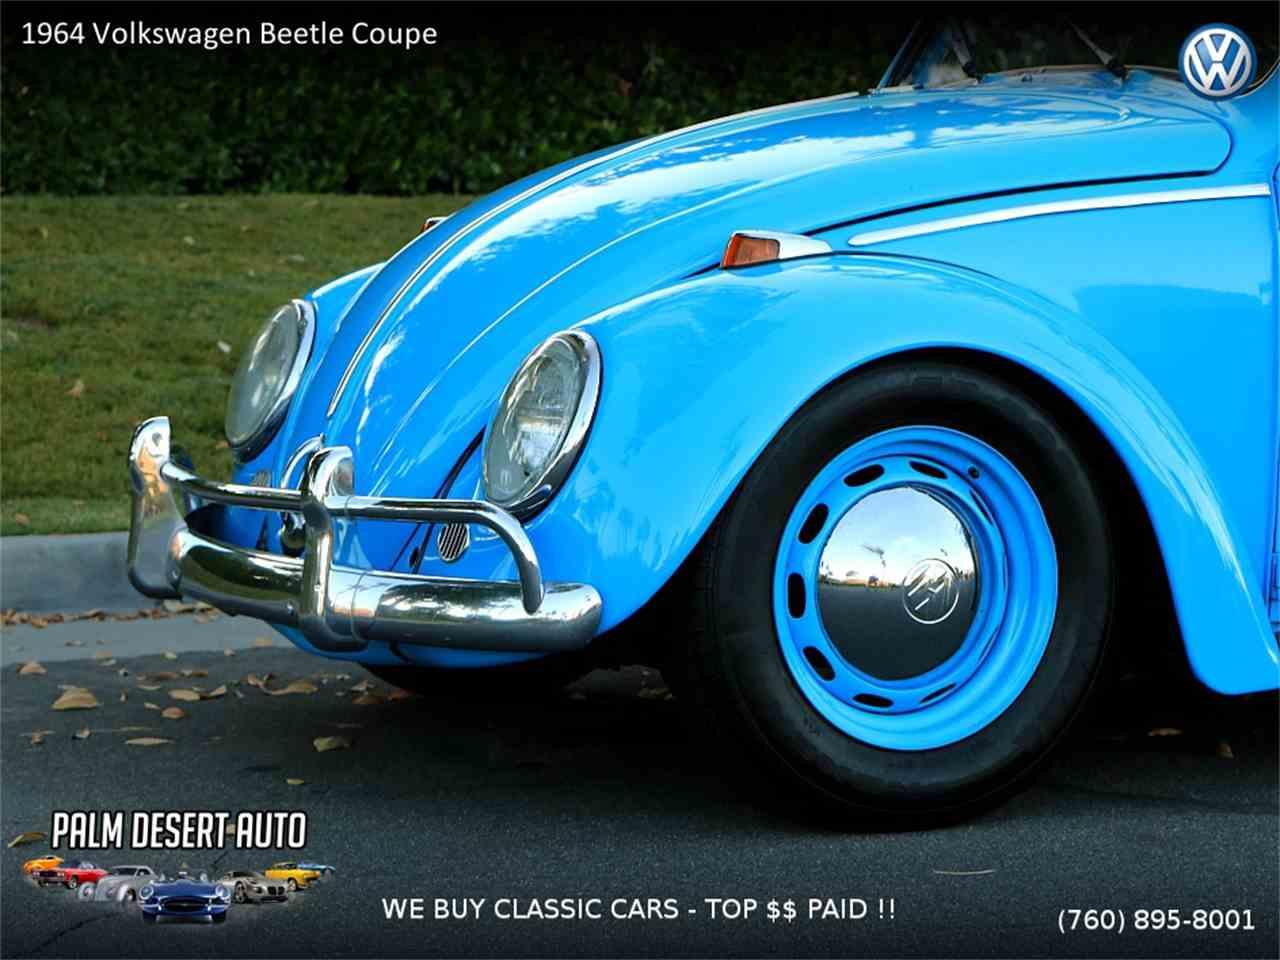 1964 Volkswagen Beetle for Sale | ClassicCars.com | CC-1058179